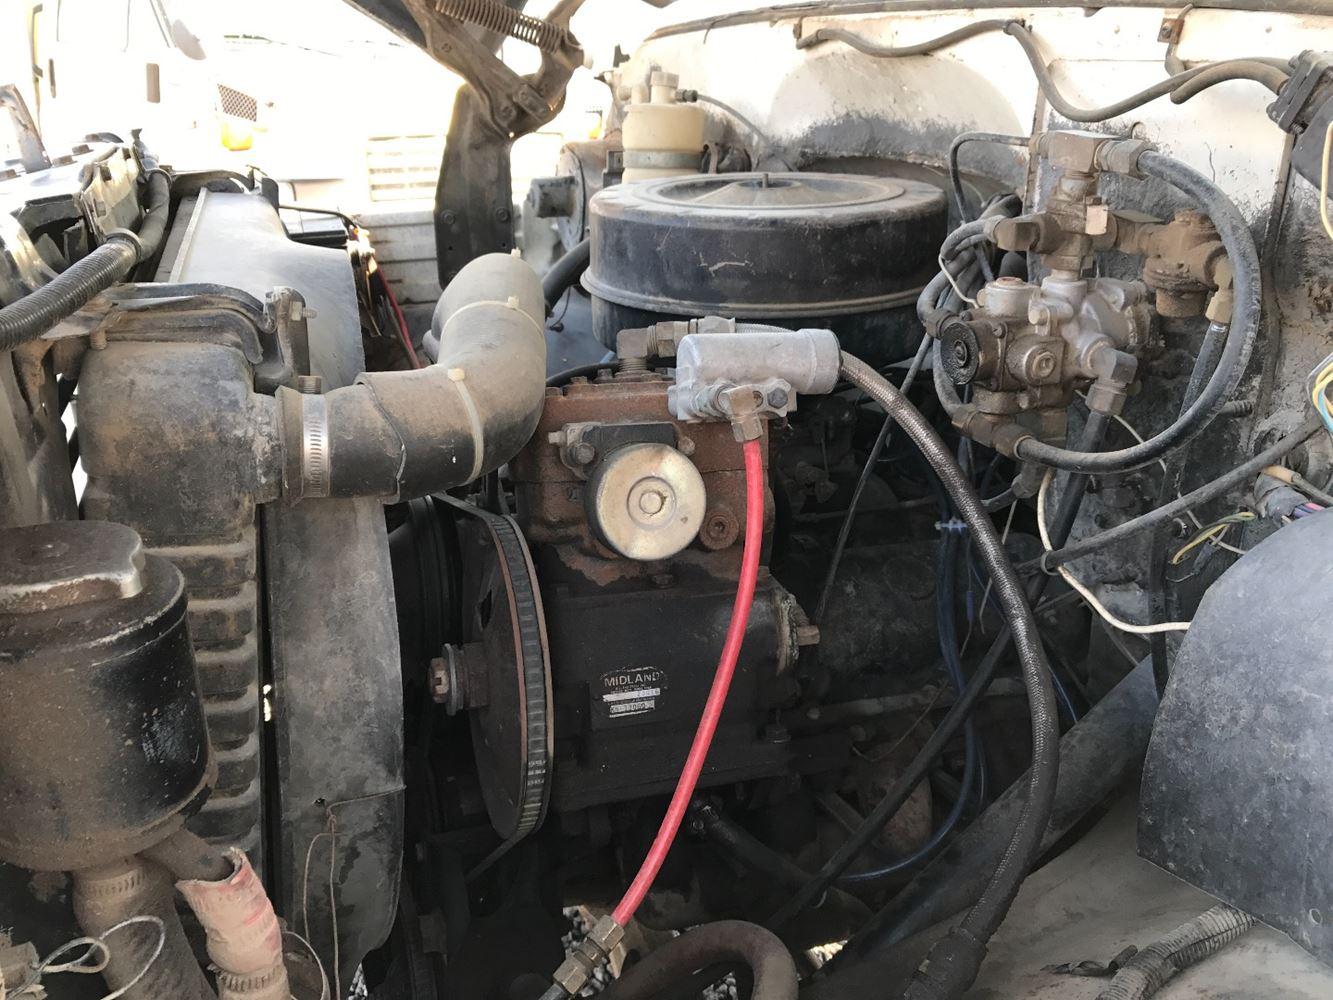 [SCHEMATICS_4NL]  1984 Chevrolet C70 | TPI | 1984 Chevy C70 Wiring Harness |  | Truck Parts Inventory